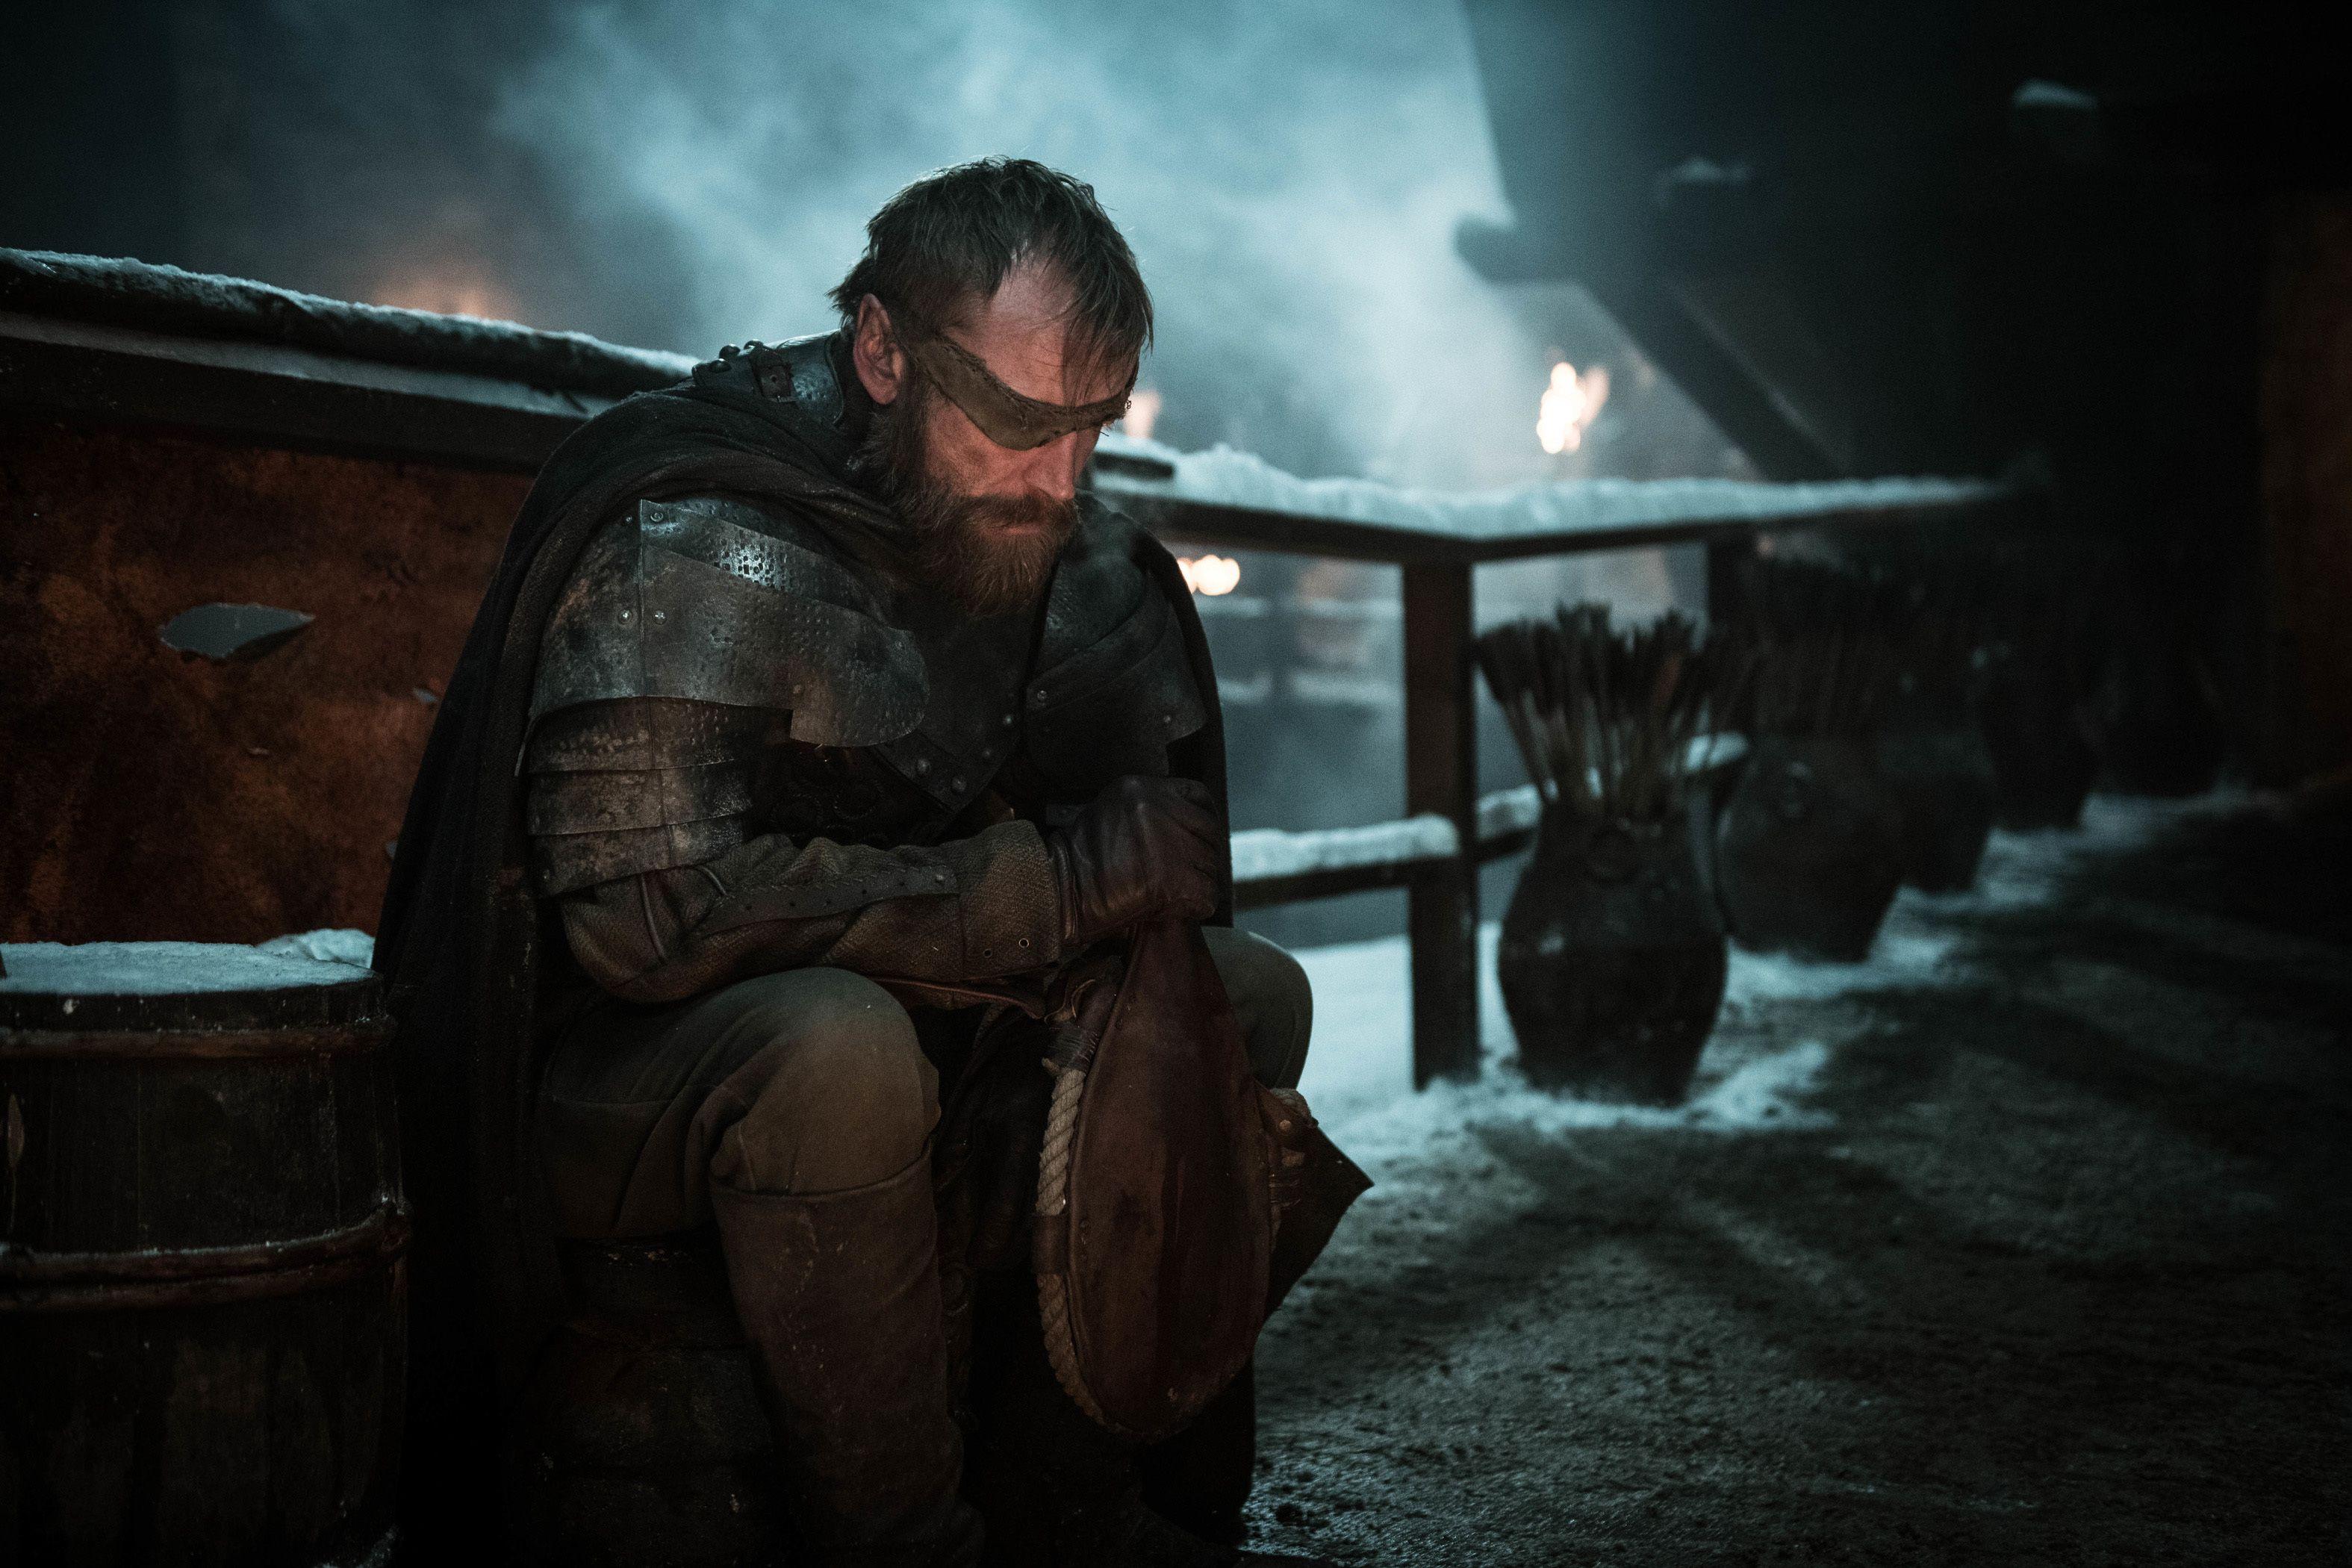 Arya Stark Was Always Going to Be the Game of Thrones Winner